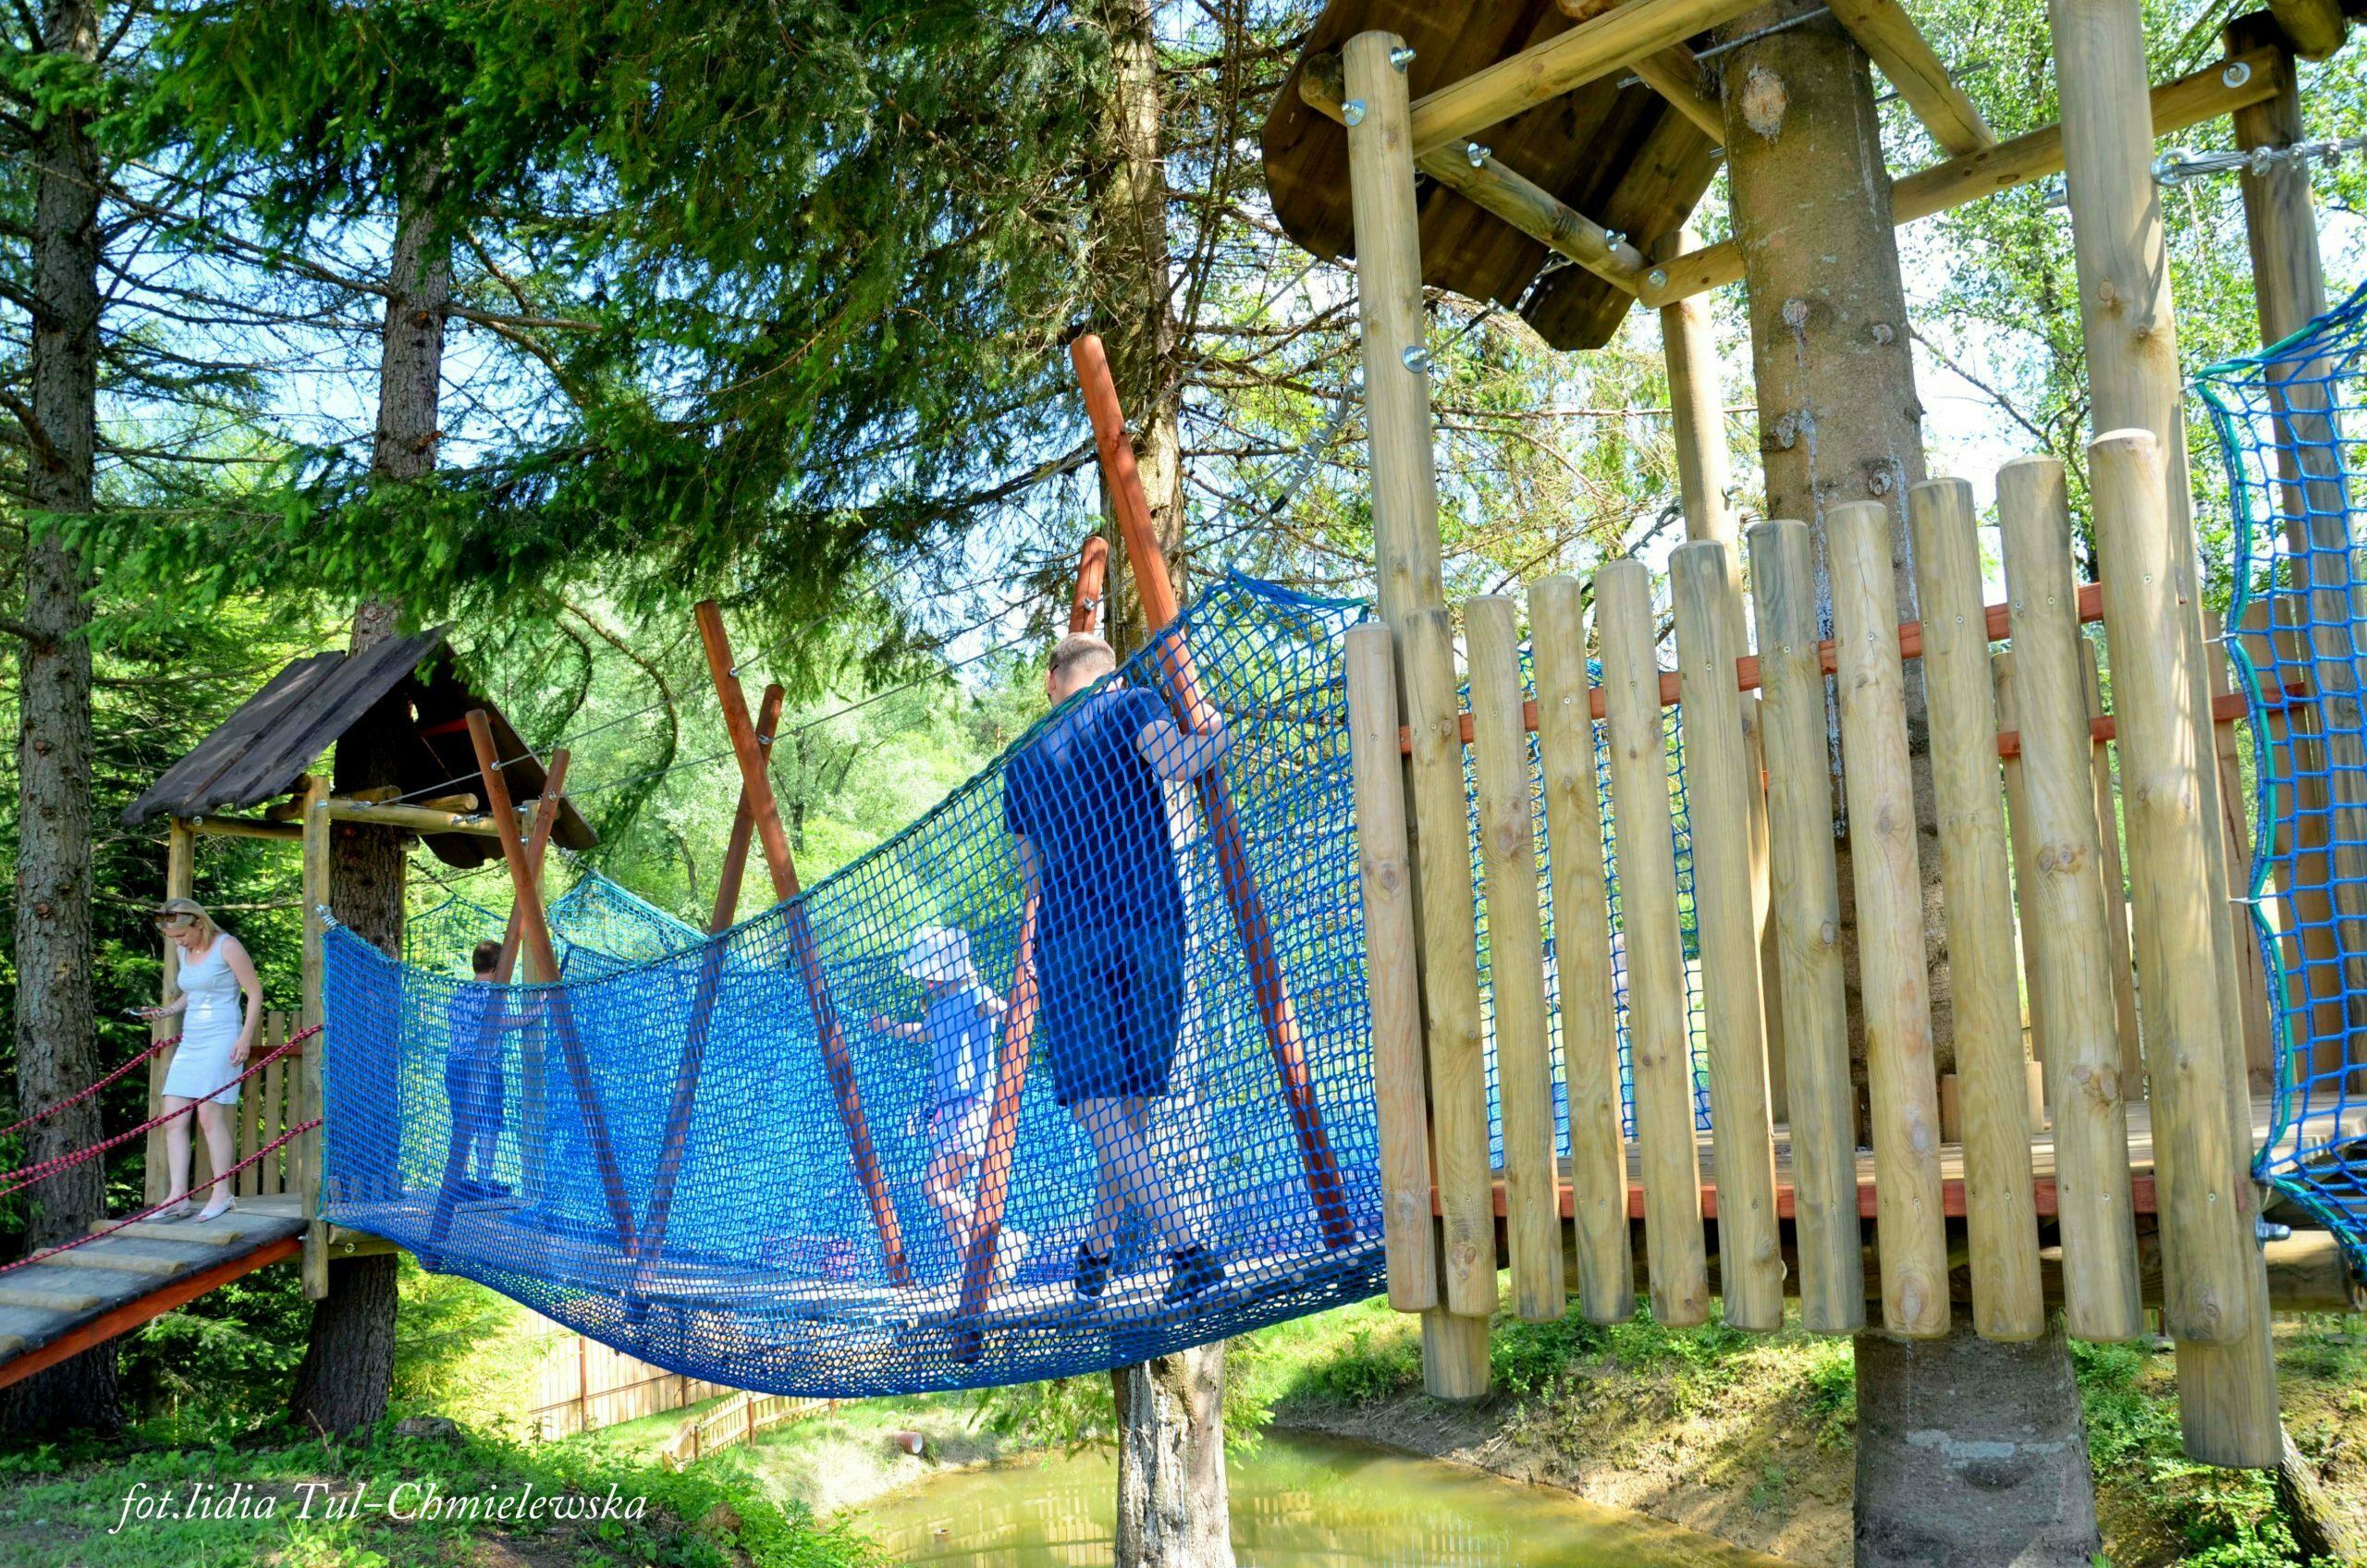 Wiejskie zoo mini park linowy fot. Lidia Tul-Chmielewska